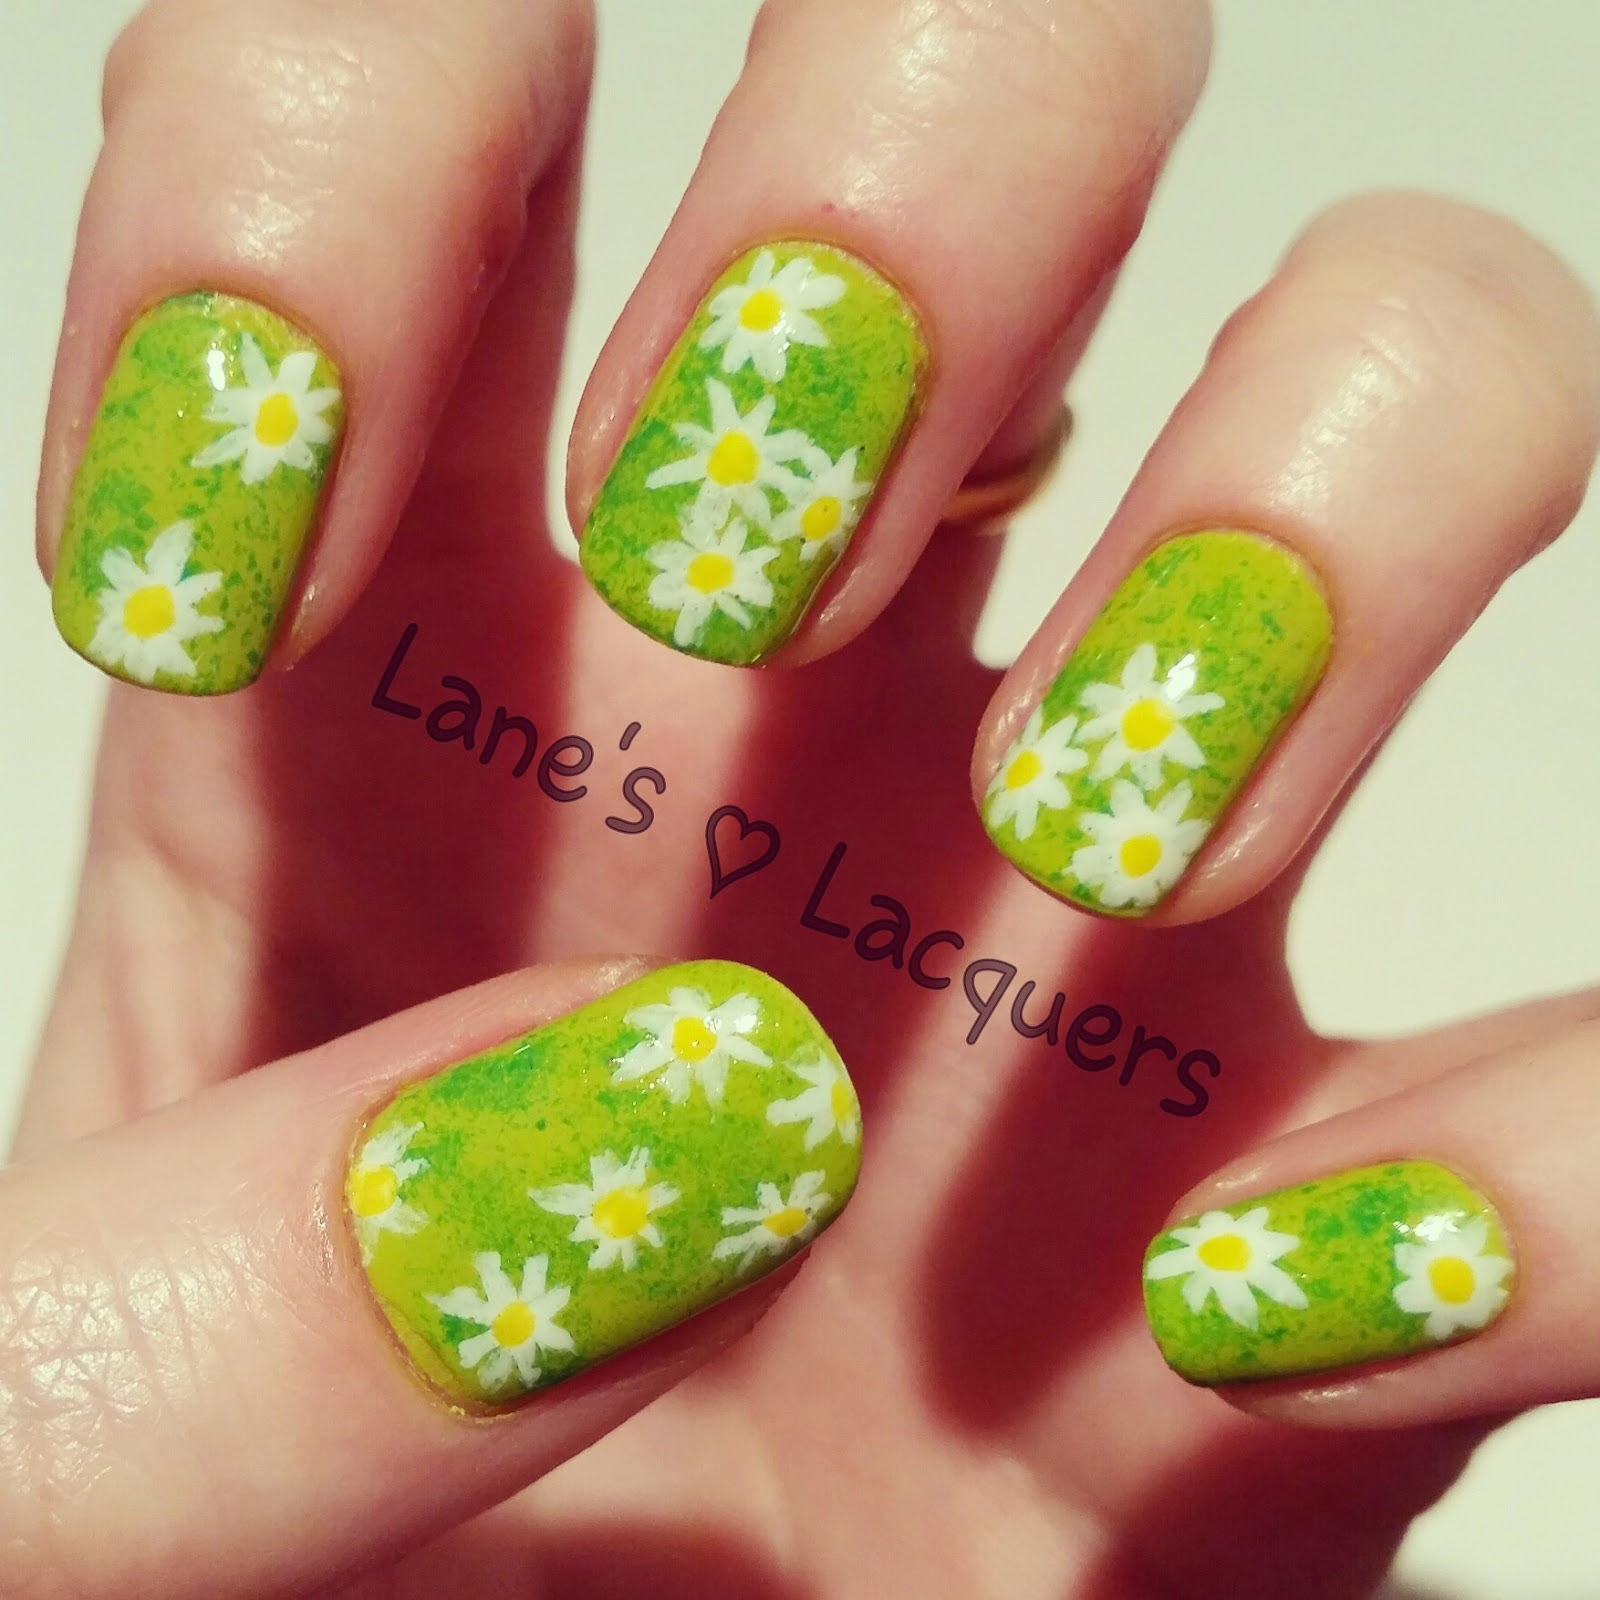 sponged-green-grass-daisies-nail-art